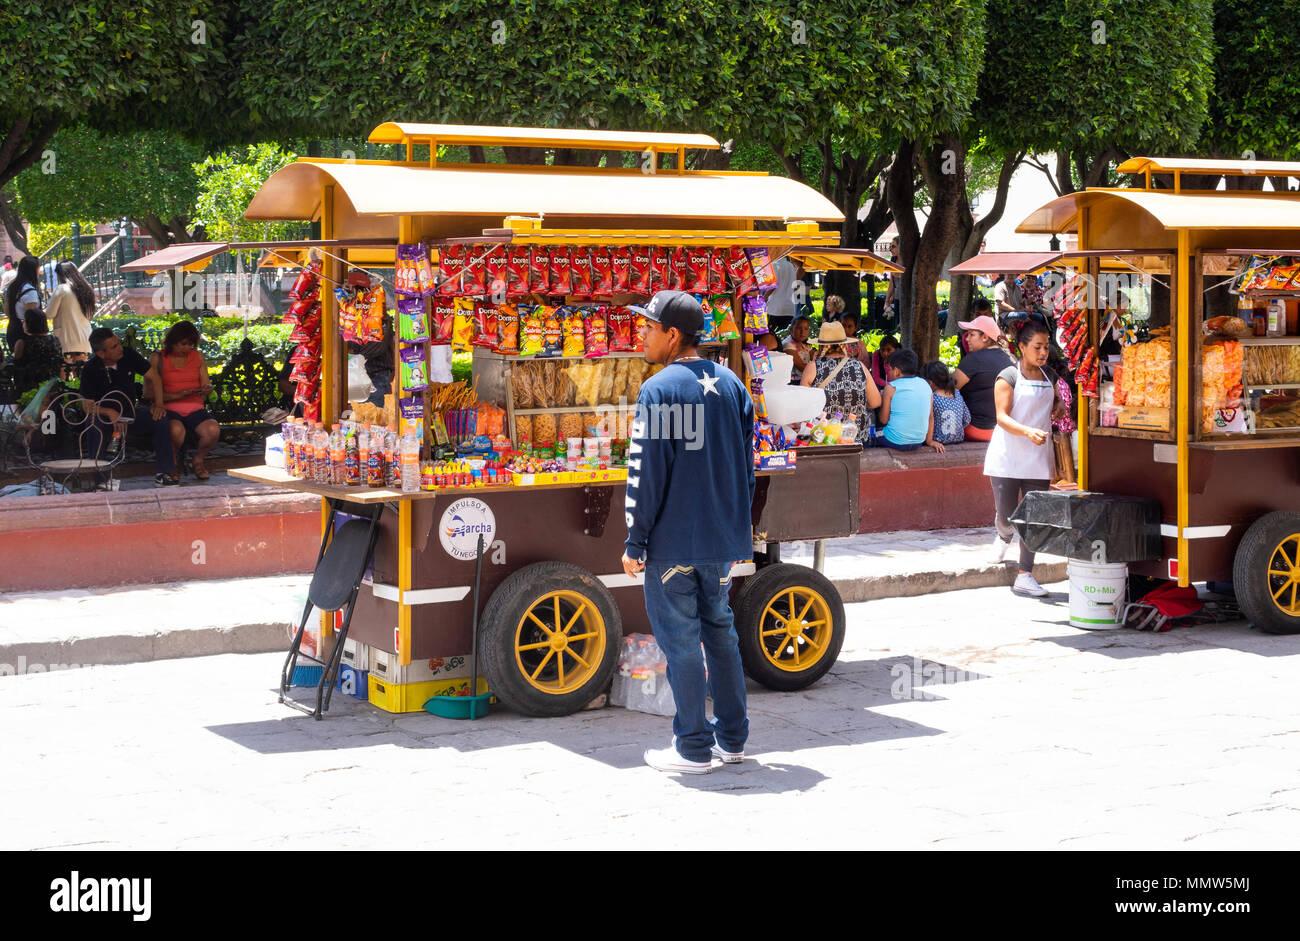 Snack stands in the Jardin Principal in San Miguel de Allende - Stock Image